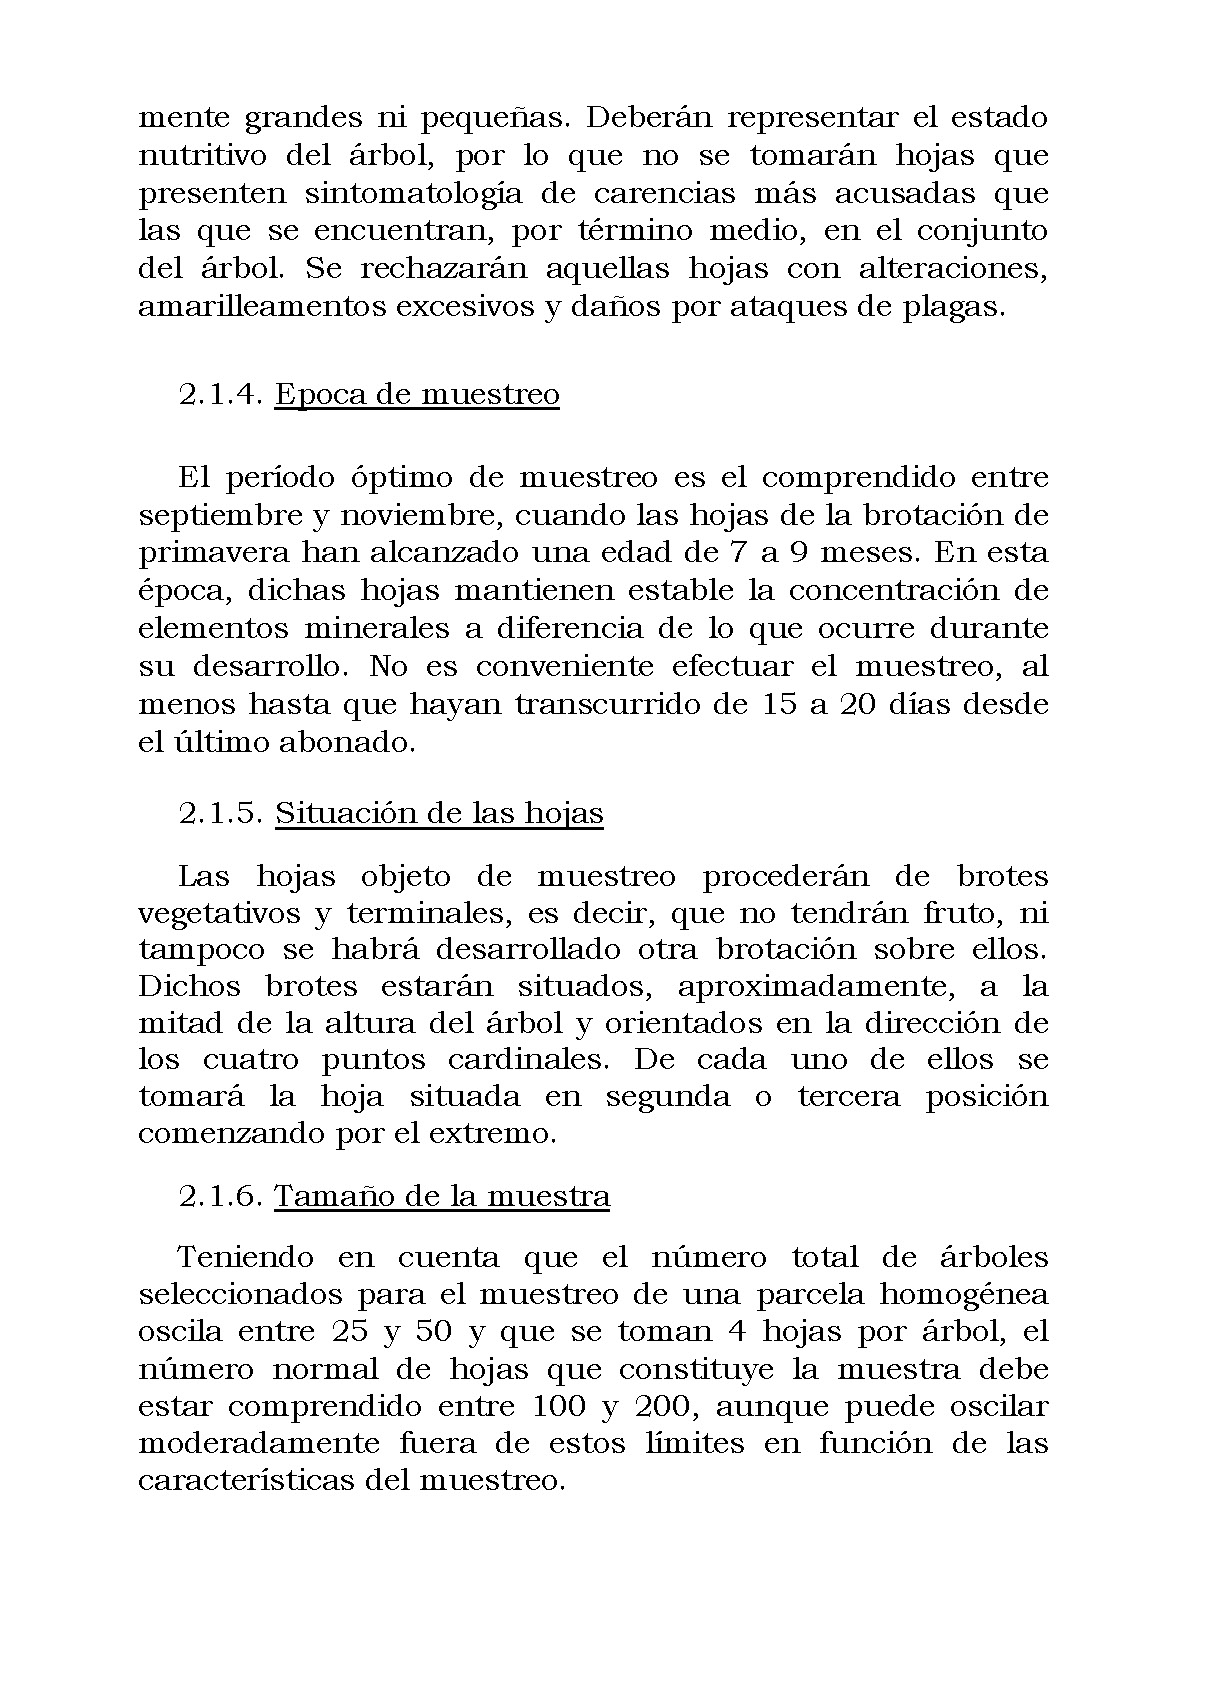 AnalisisMin_Página_15